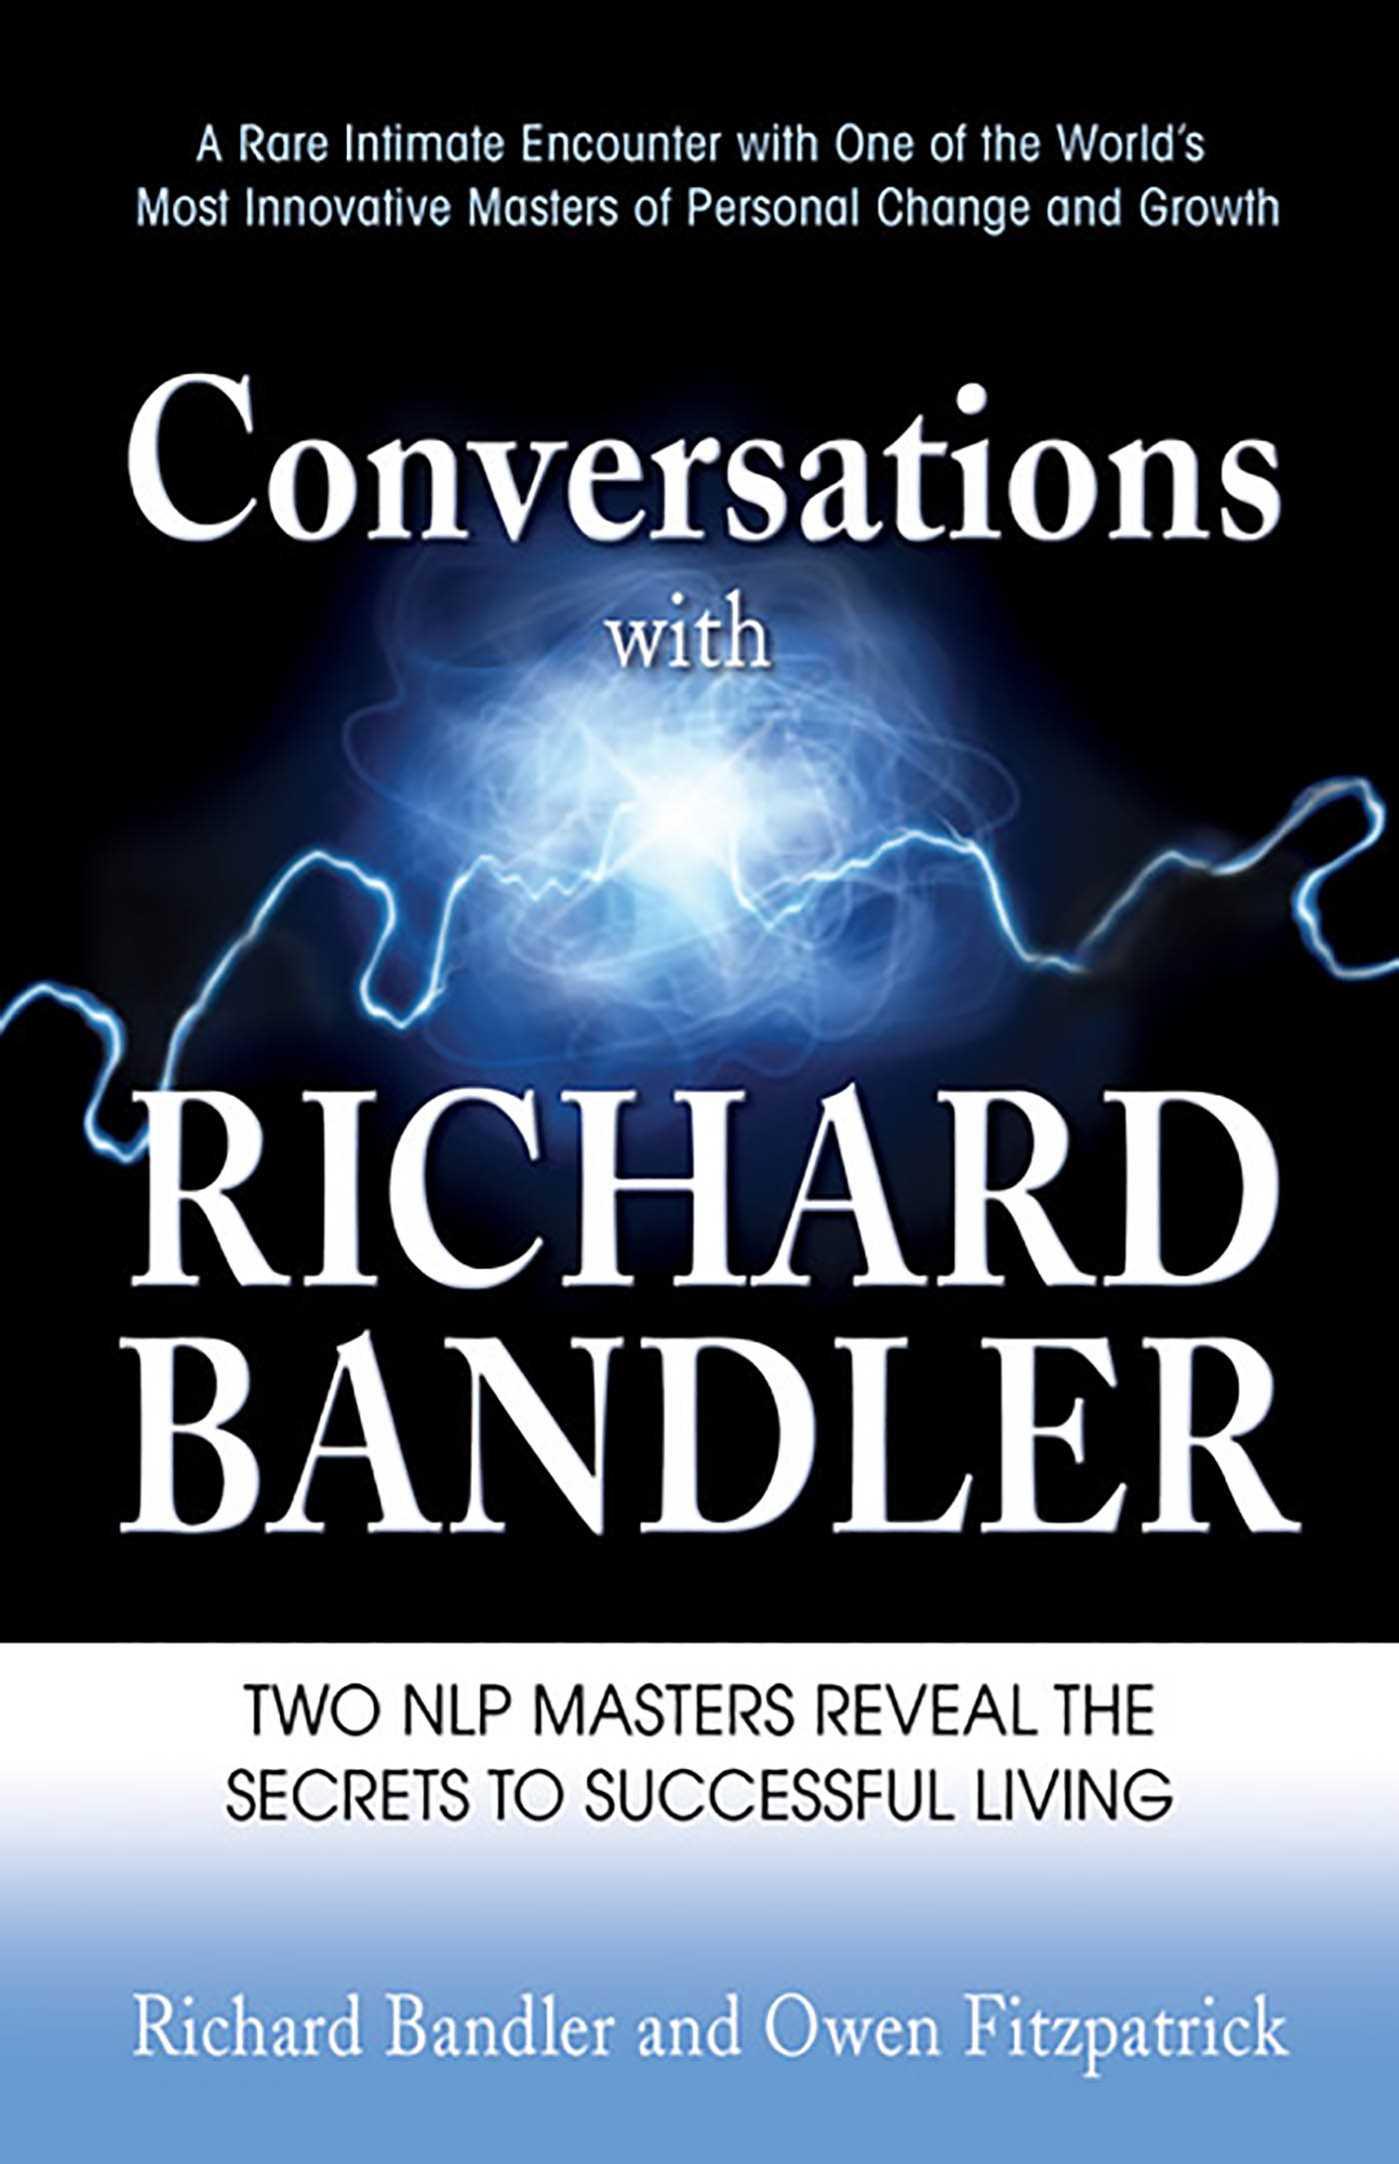 Nlp Books Best Sellers - NLP Practicioner